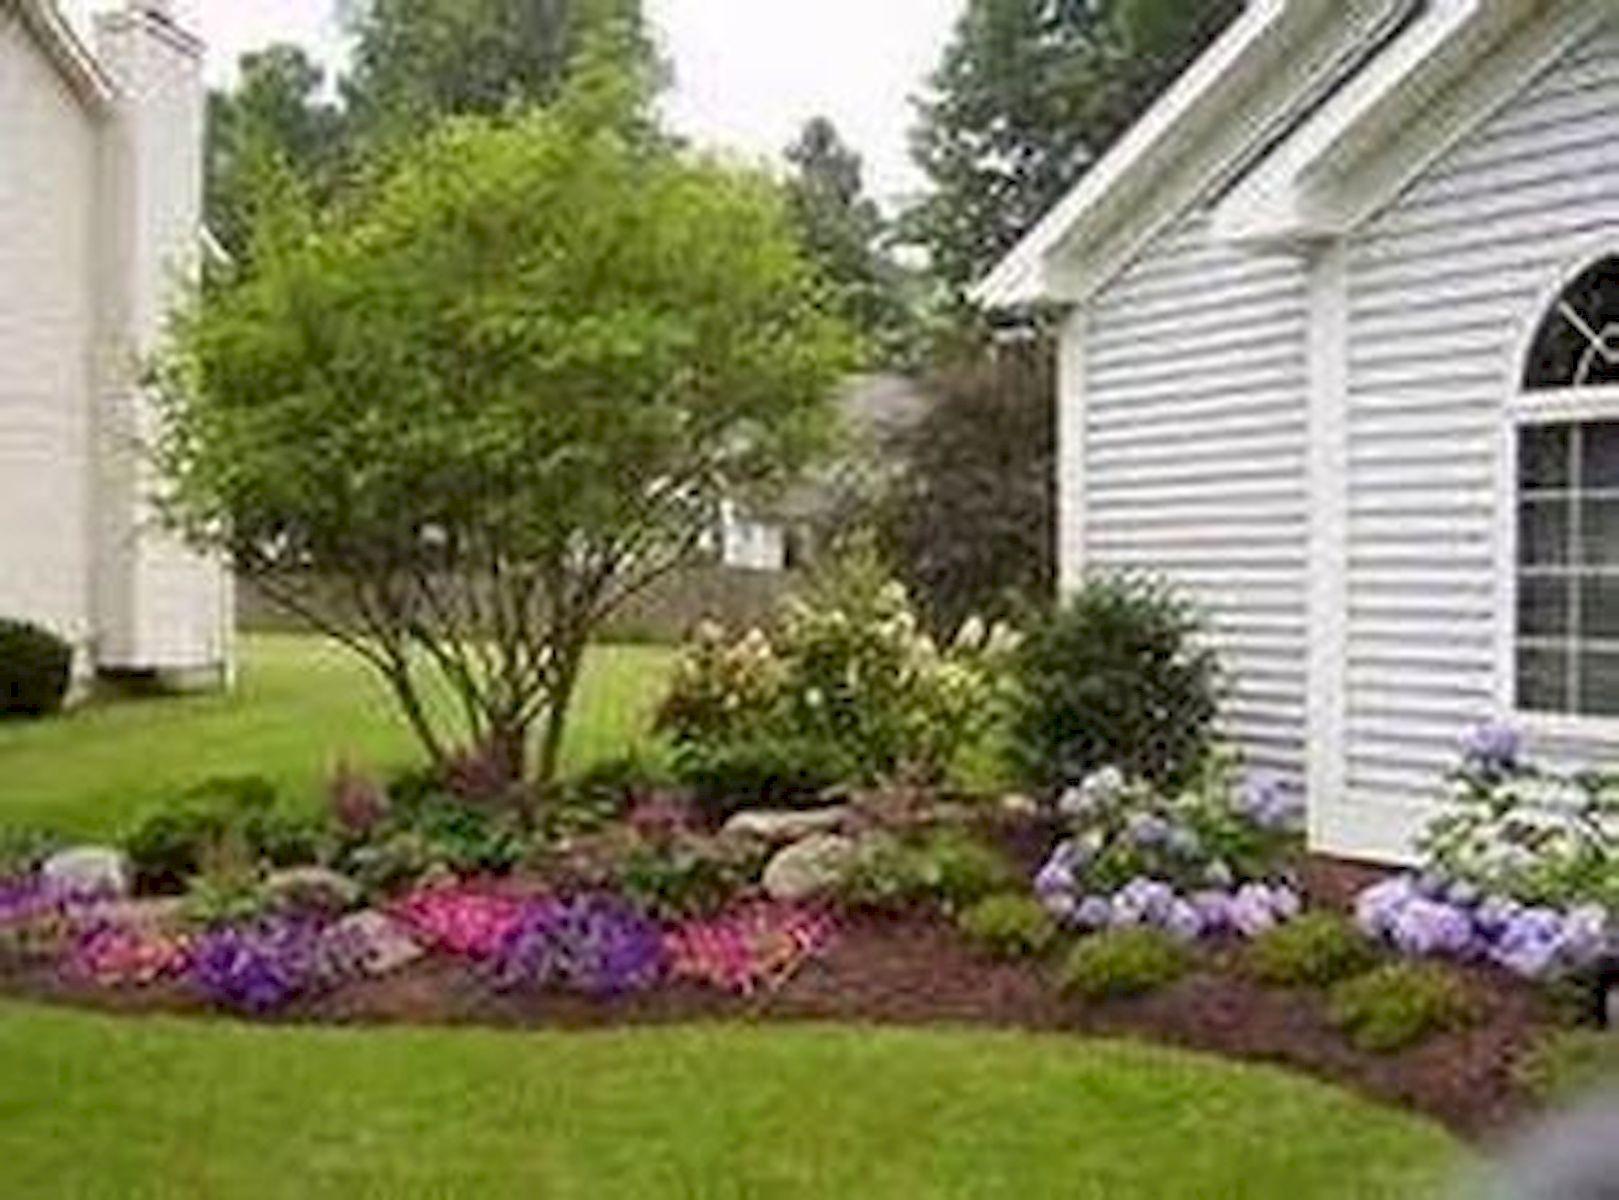 48 Stunning Front Yard Landscaping Ideas That Make Beautiful Garden (28)